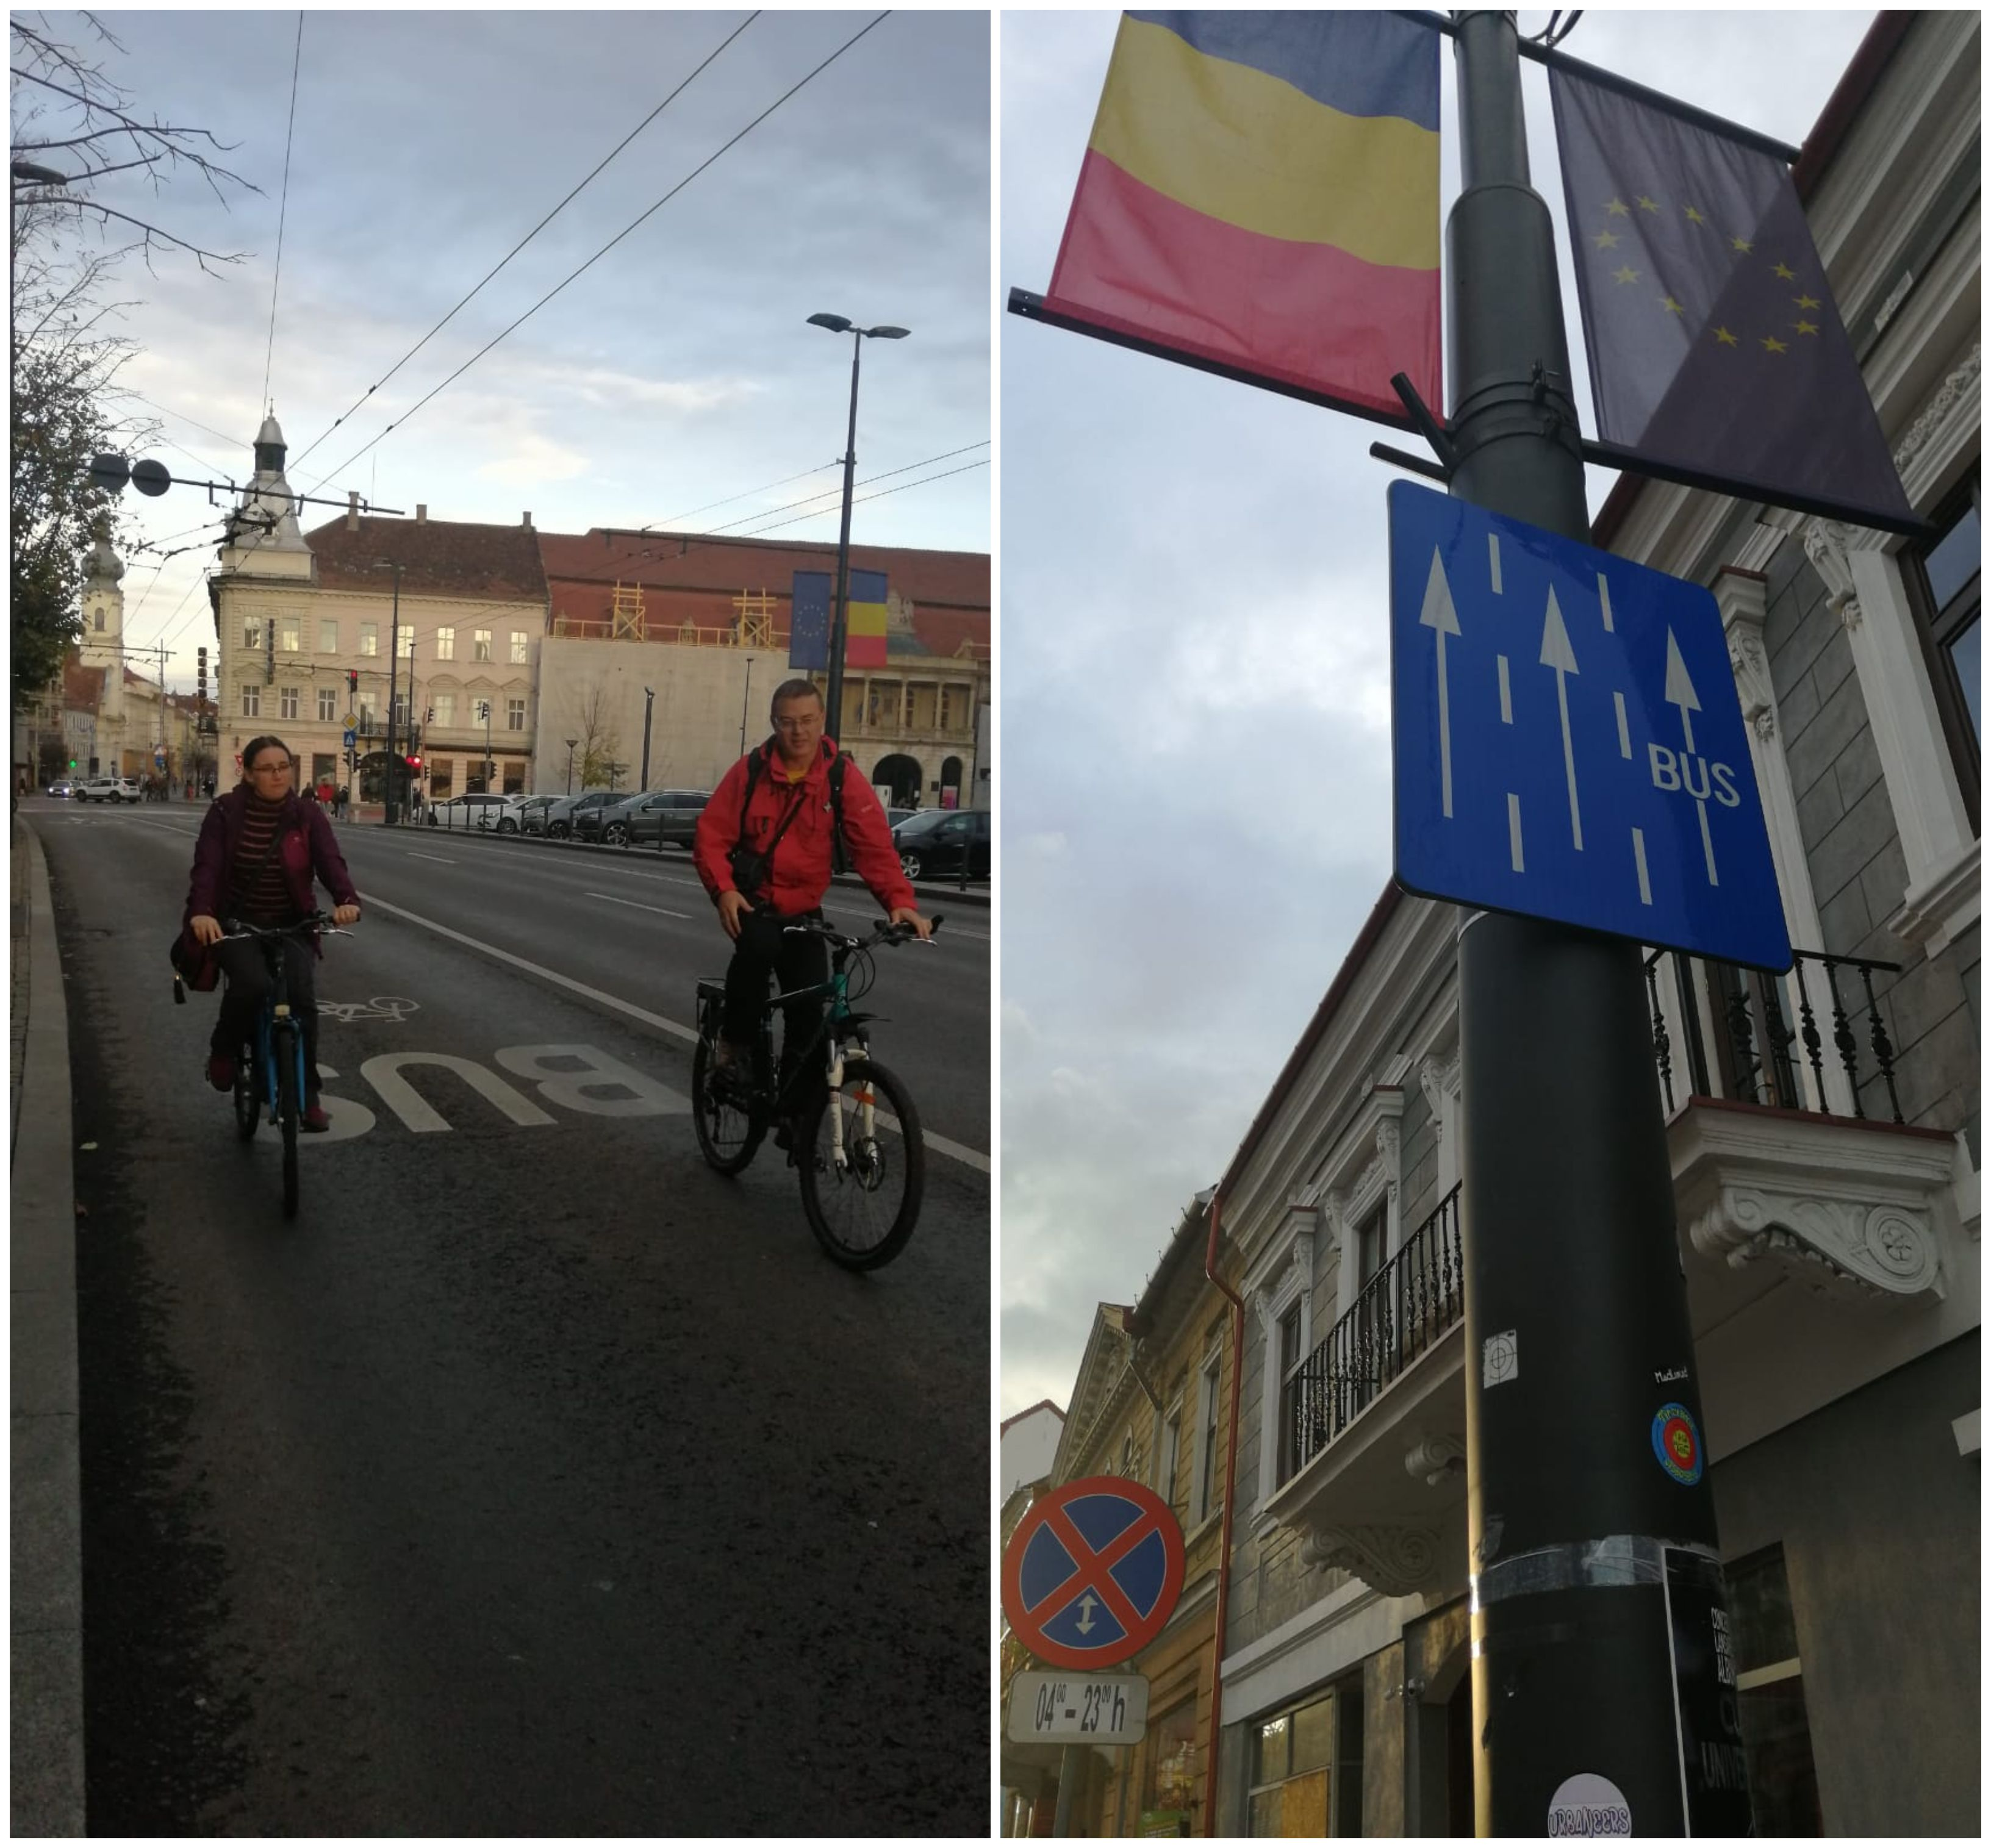 probikeaddiction infrastructura pentru biciclete cluj banda unica bus si bicicleta